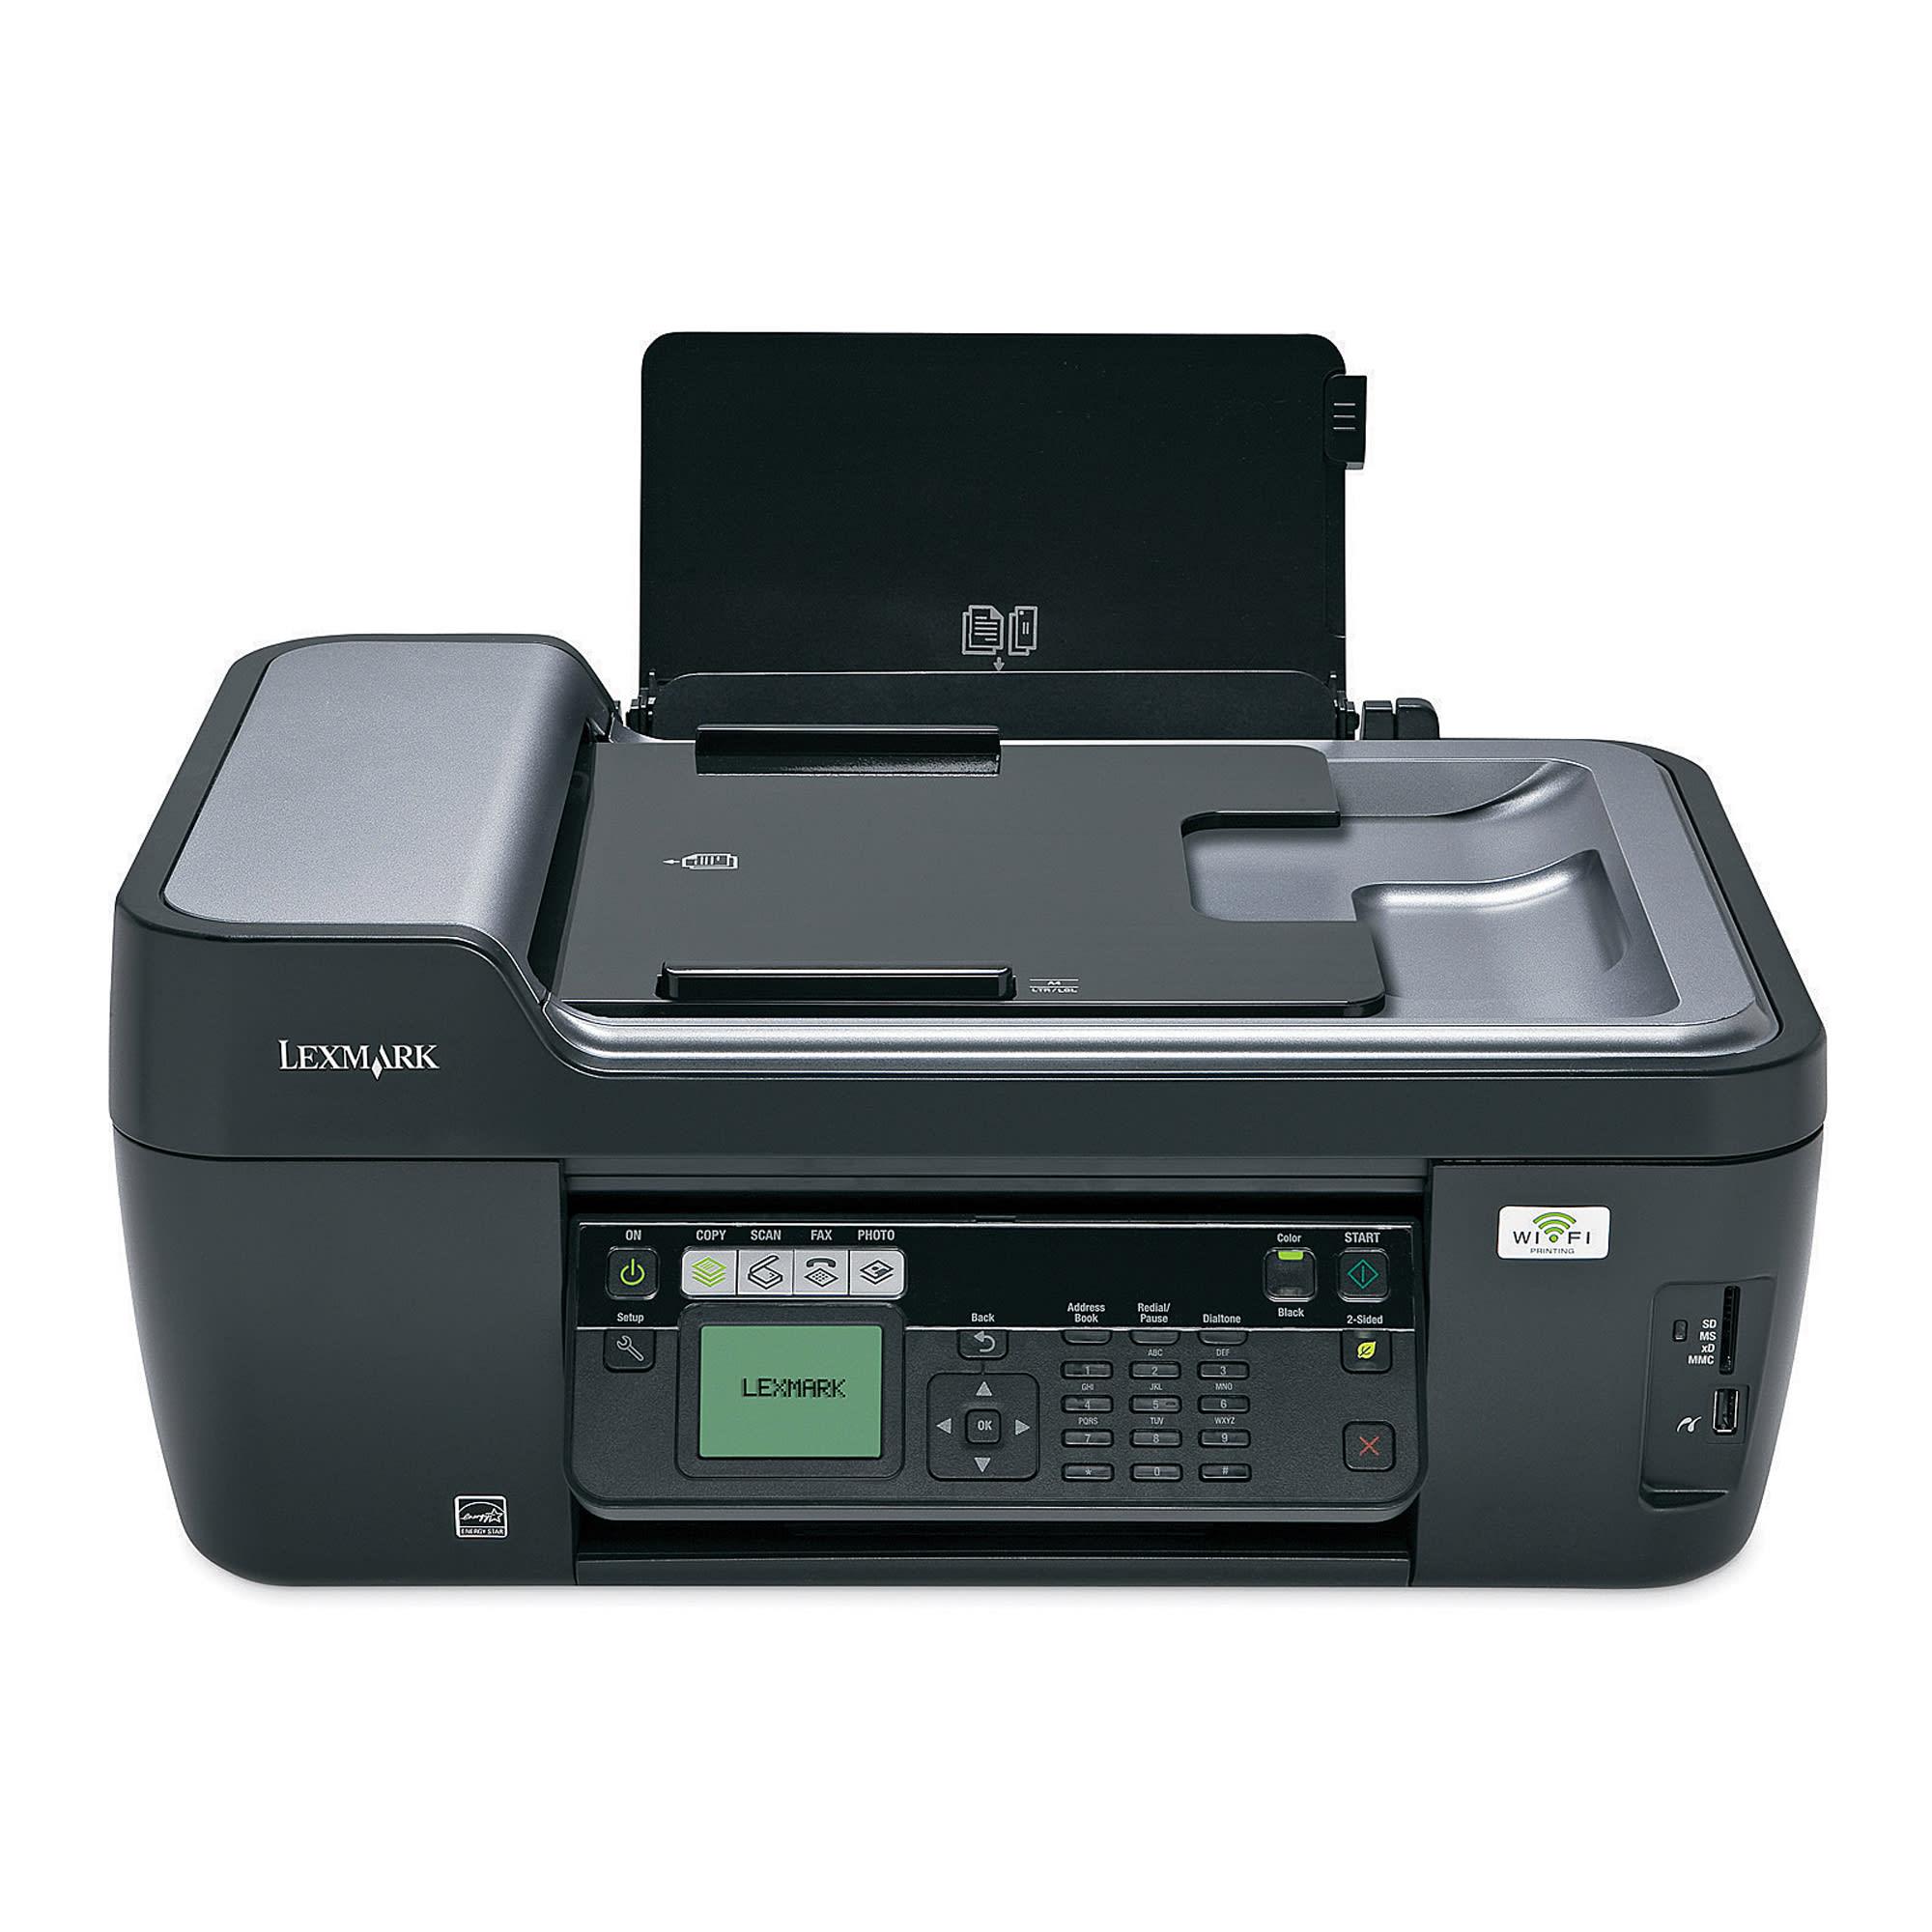 Lexmark™ Prospect Pro205 Wireless All-In-One Printer, Copier, Scanner, Fax